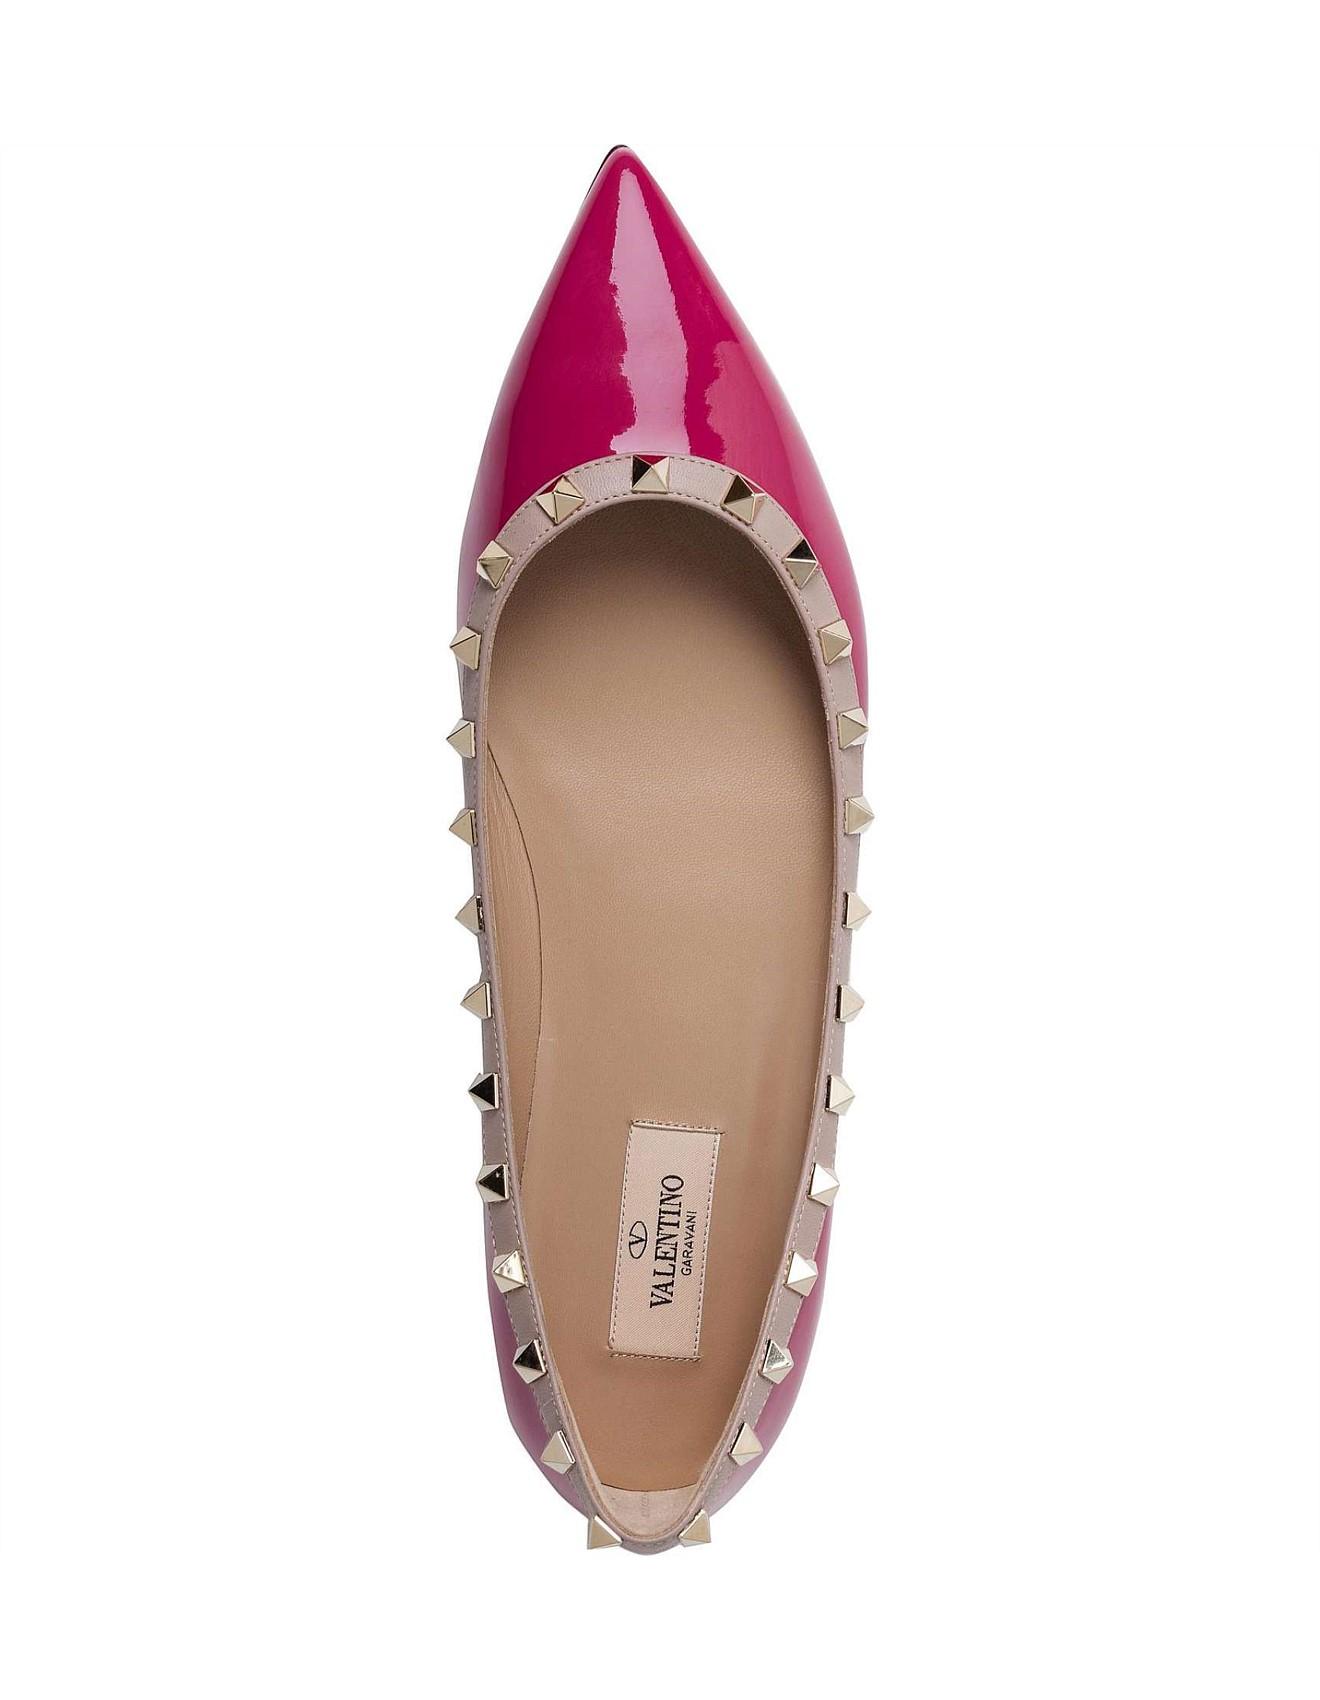 Valentino Shoes Sale David Jones